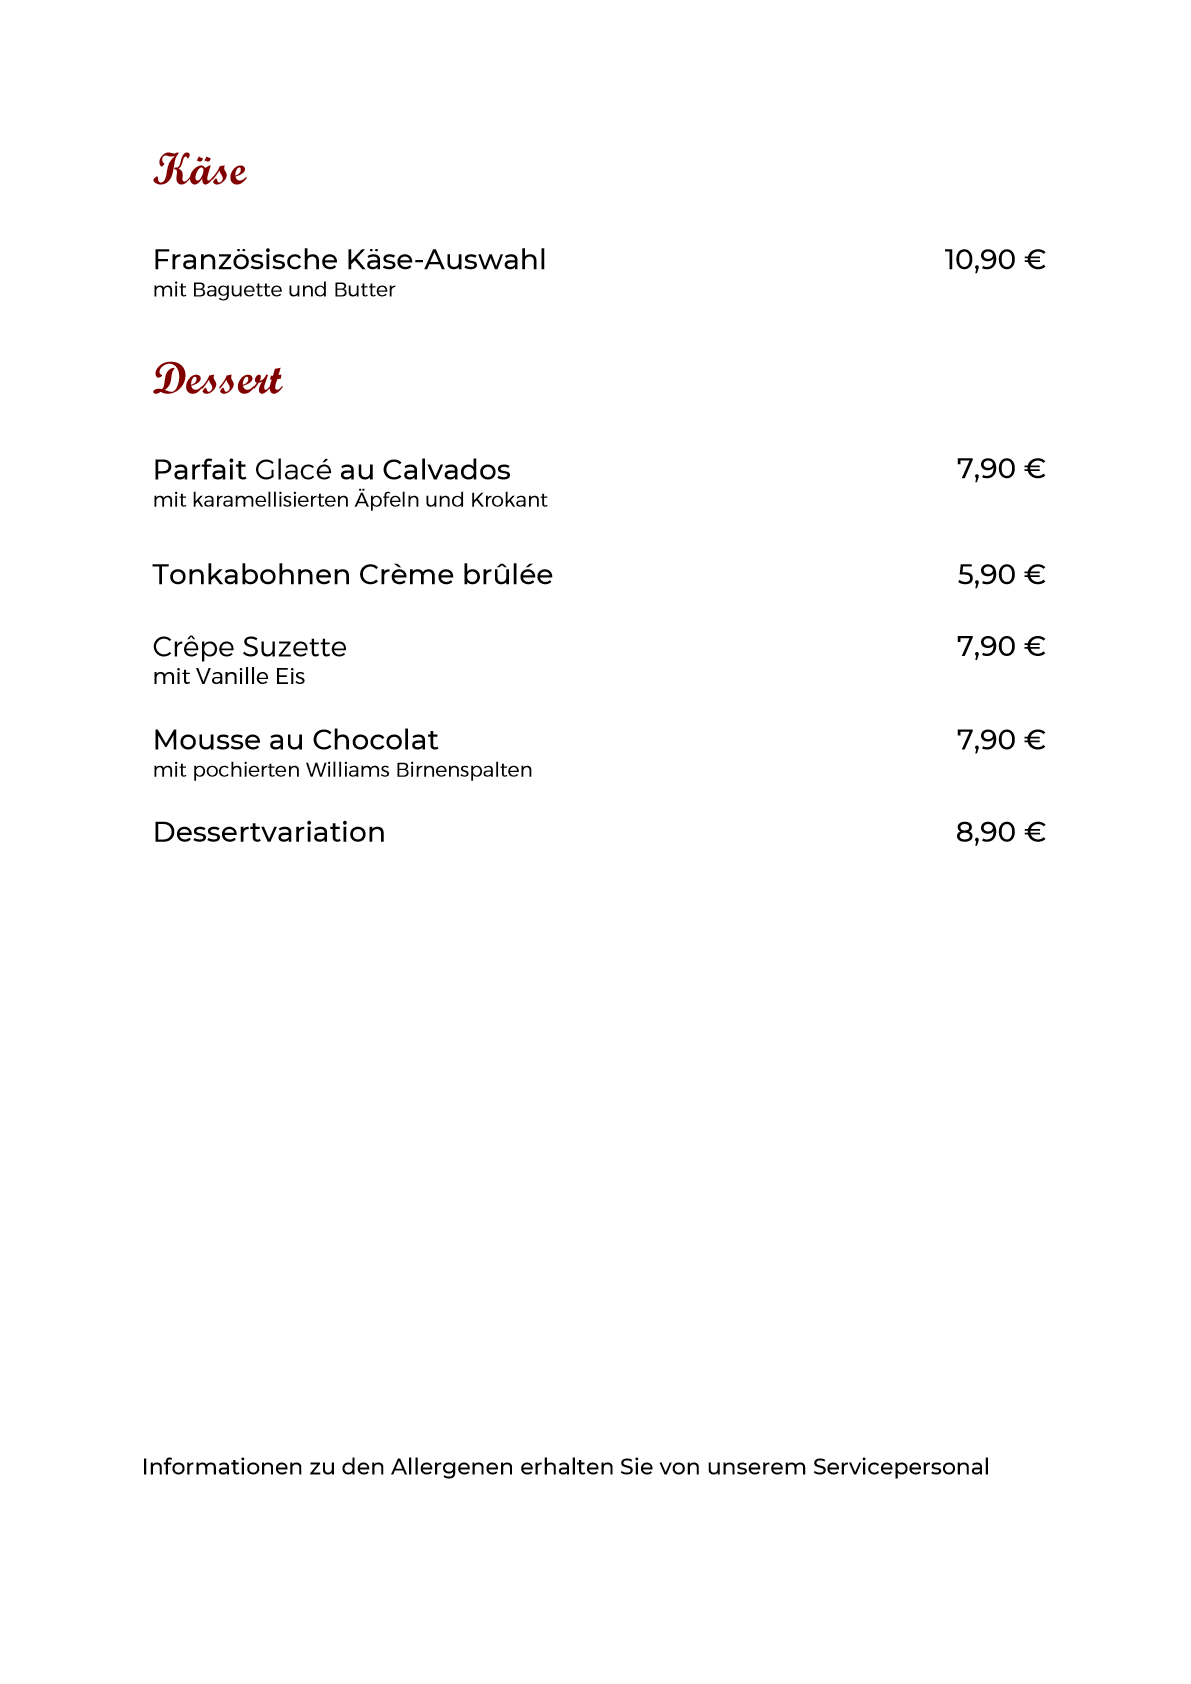 Speisekarte Dessert neu 15.09.2021